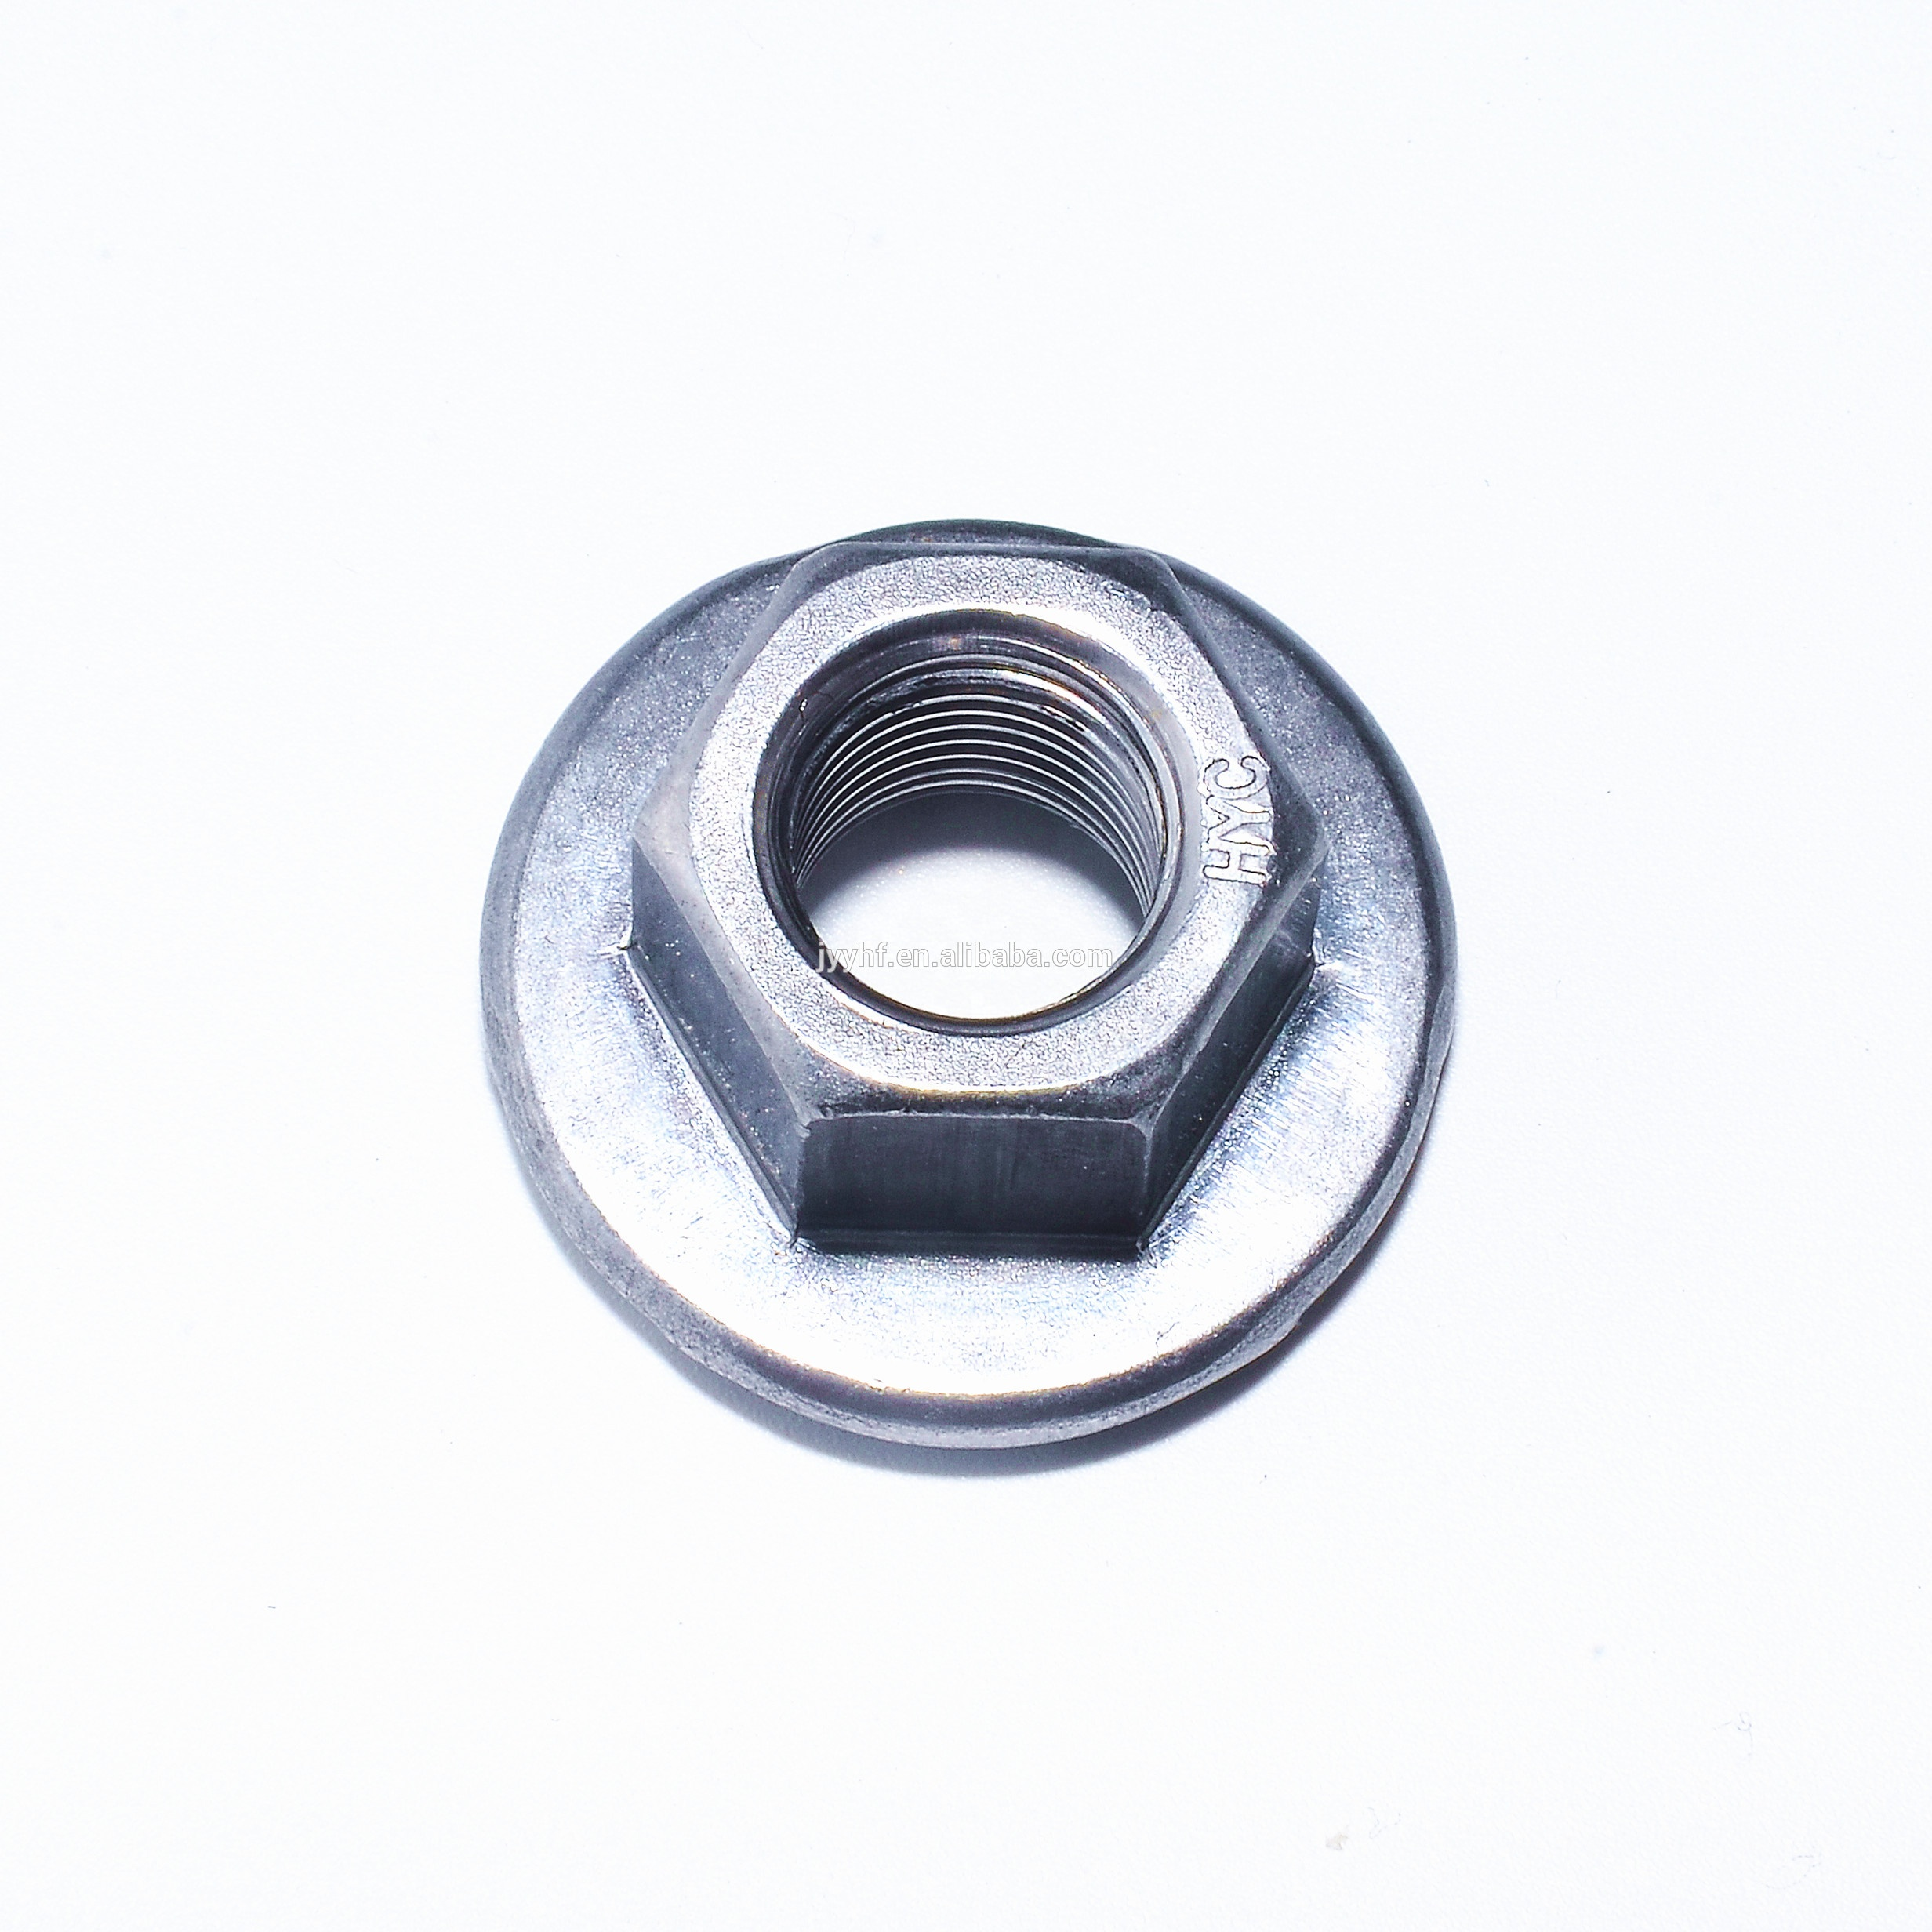 M10-1.5 Metric Hex Flange All Metal Lock Nut Class 10 DIN 6927 Zinc Plate 15